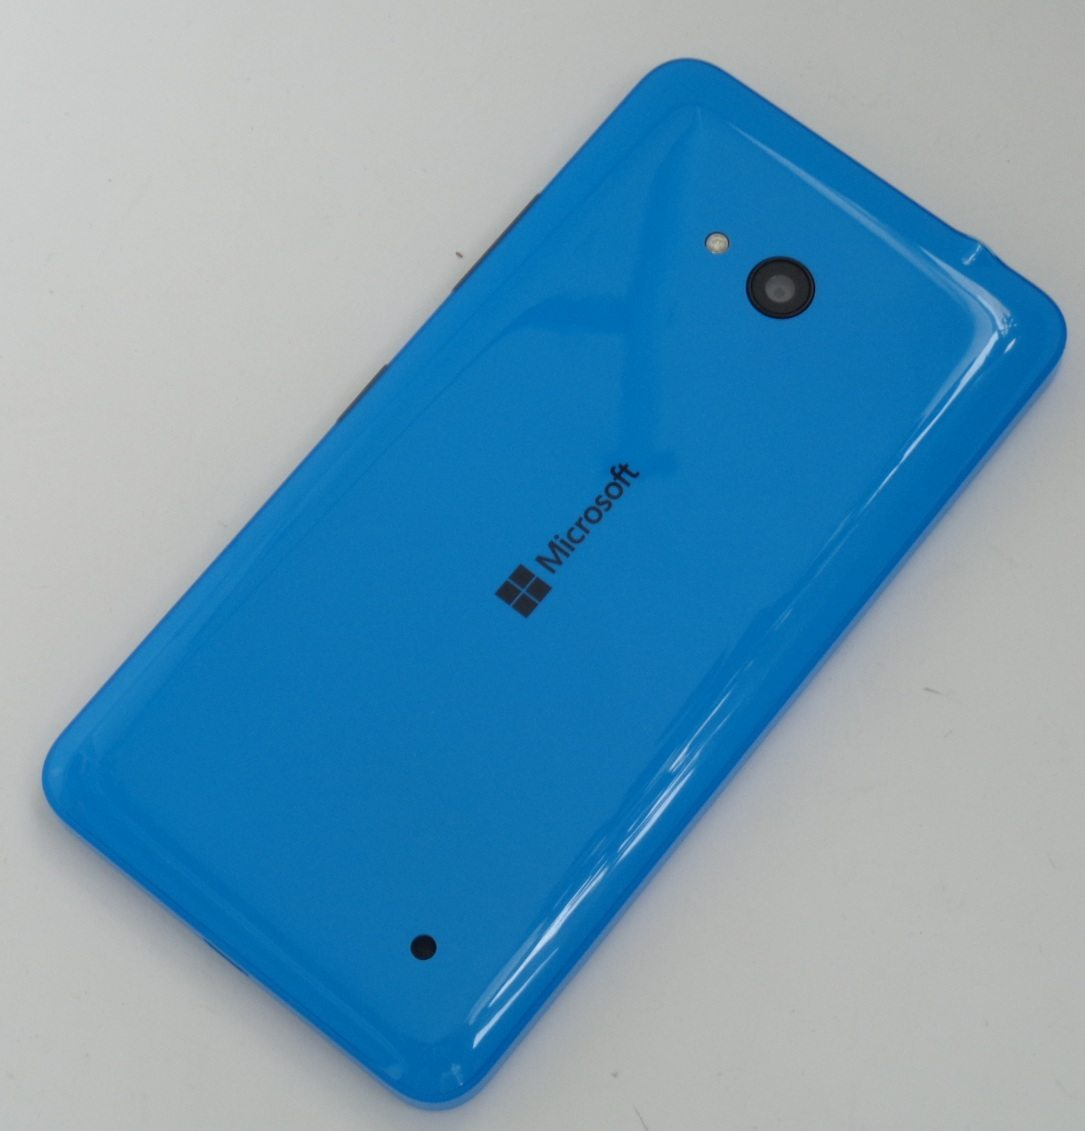 Microsoft Lumia 640 LTE back